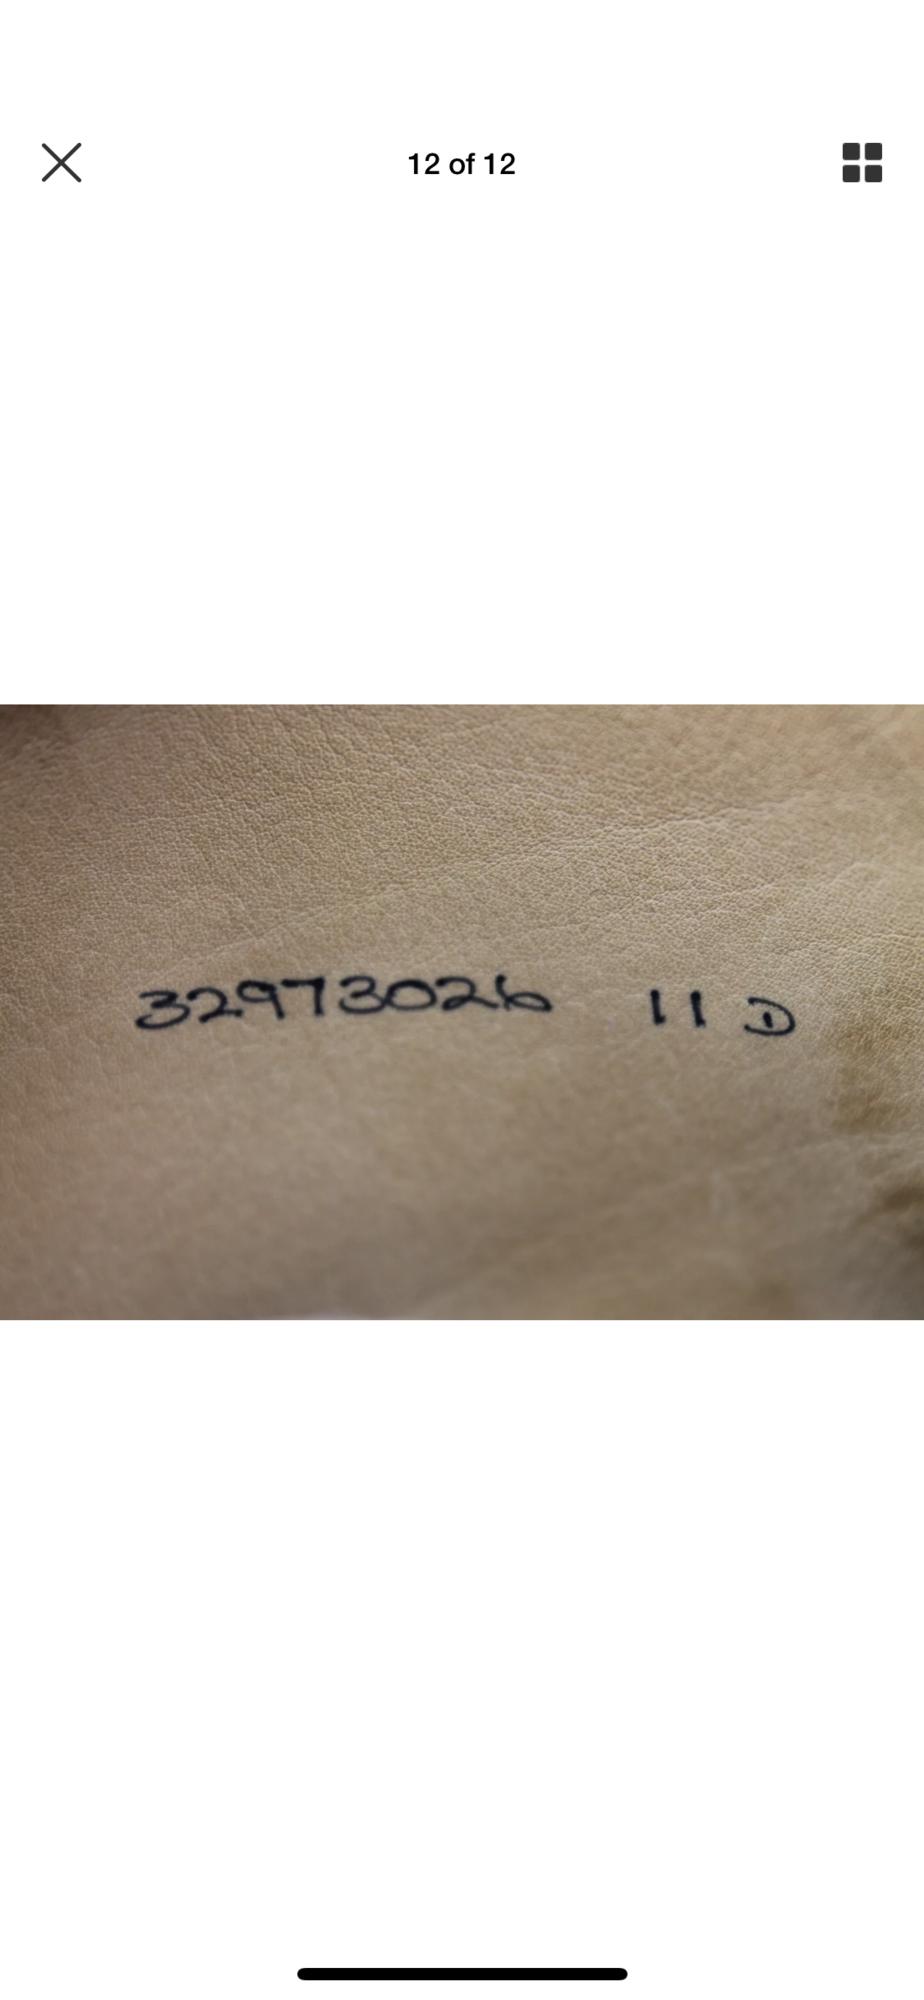 2670AAB1-AA58-445A-A818-4BDB5B1BFCD5.png